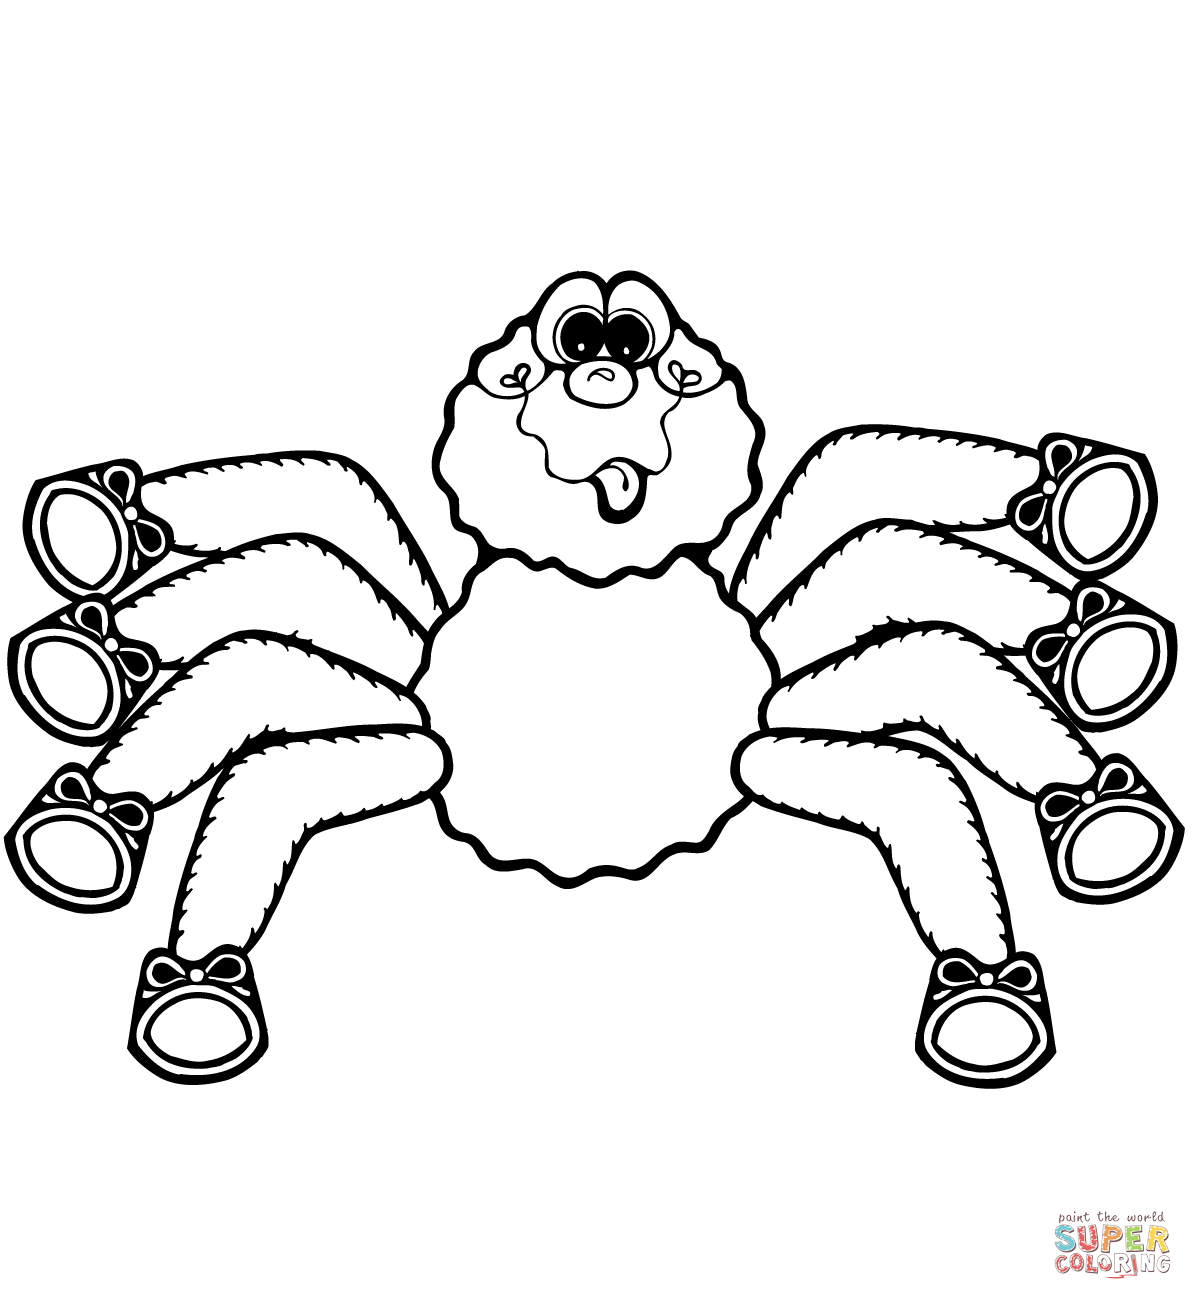 Cartoon Spider Coloring Page